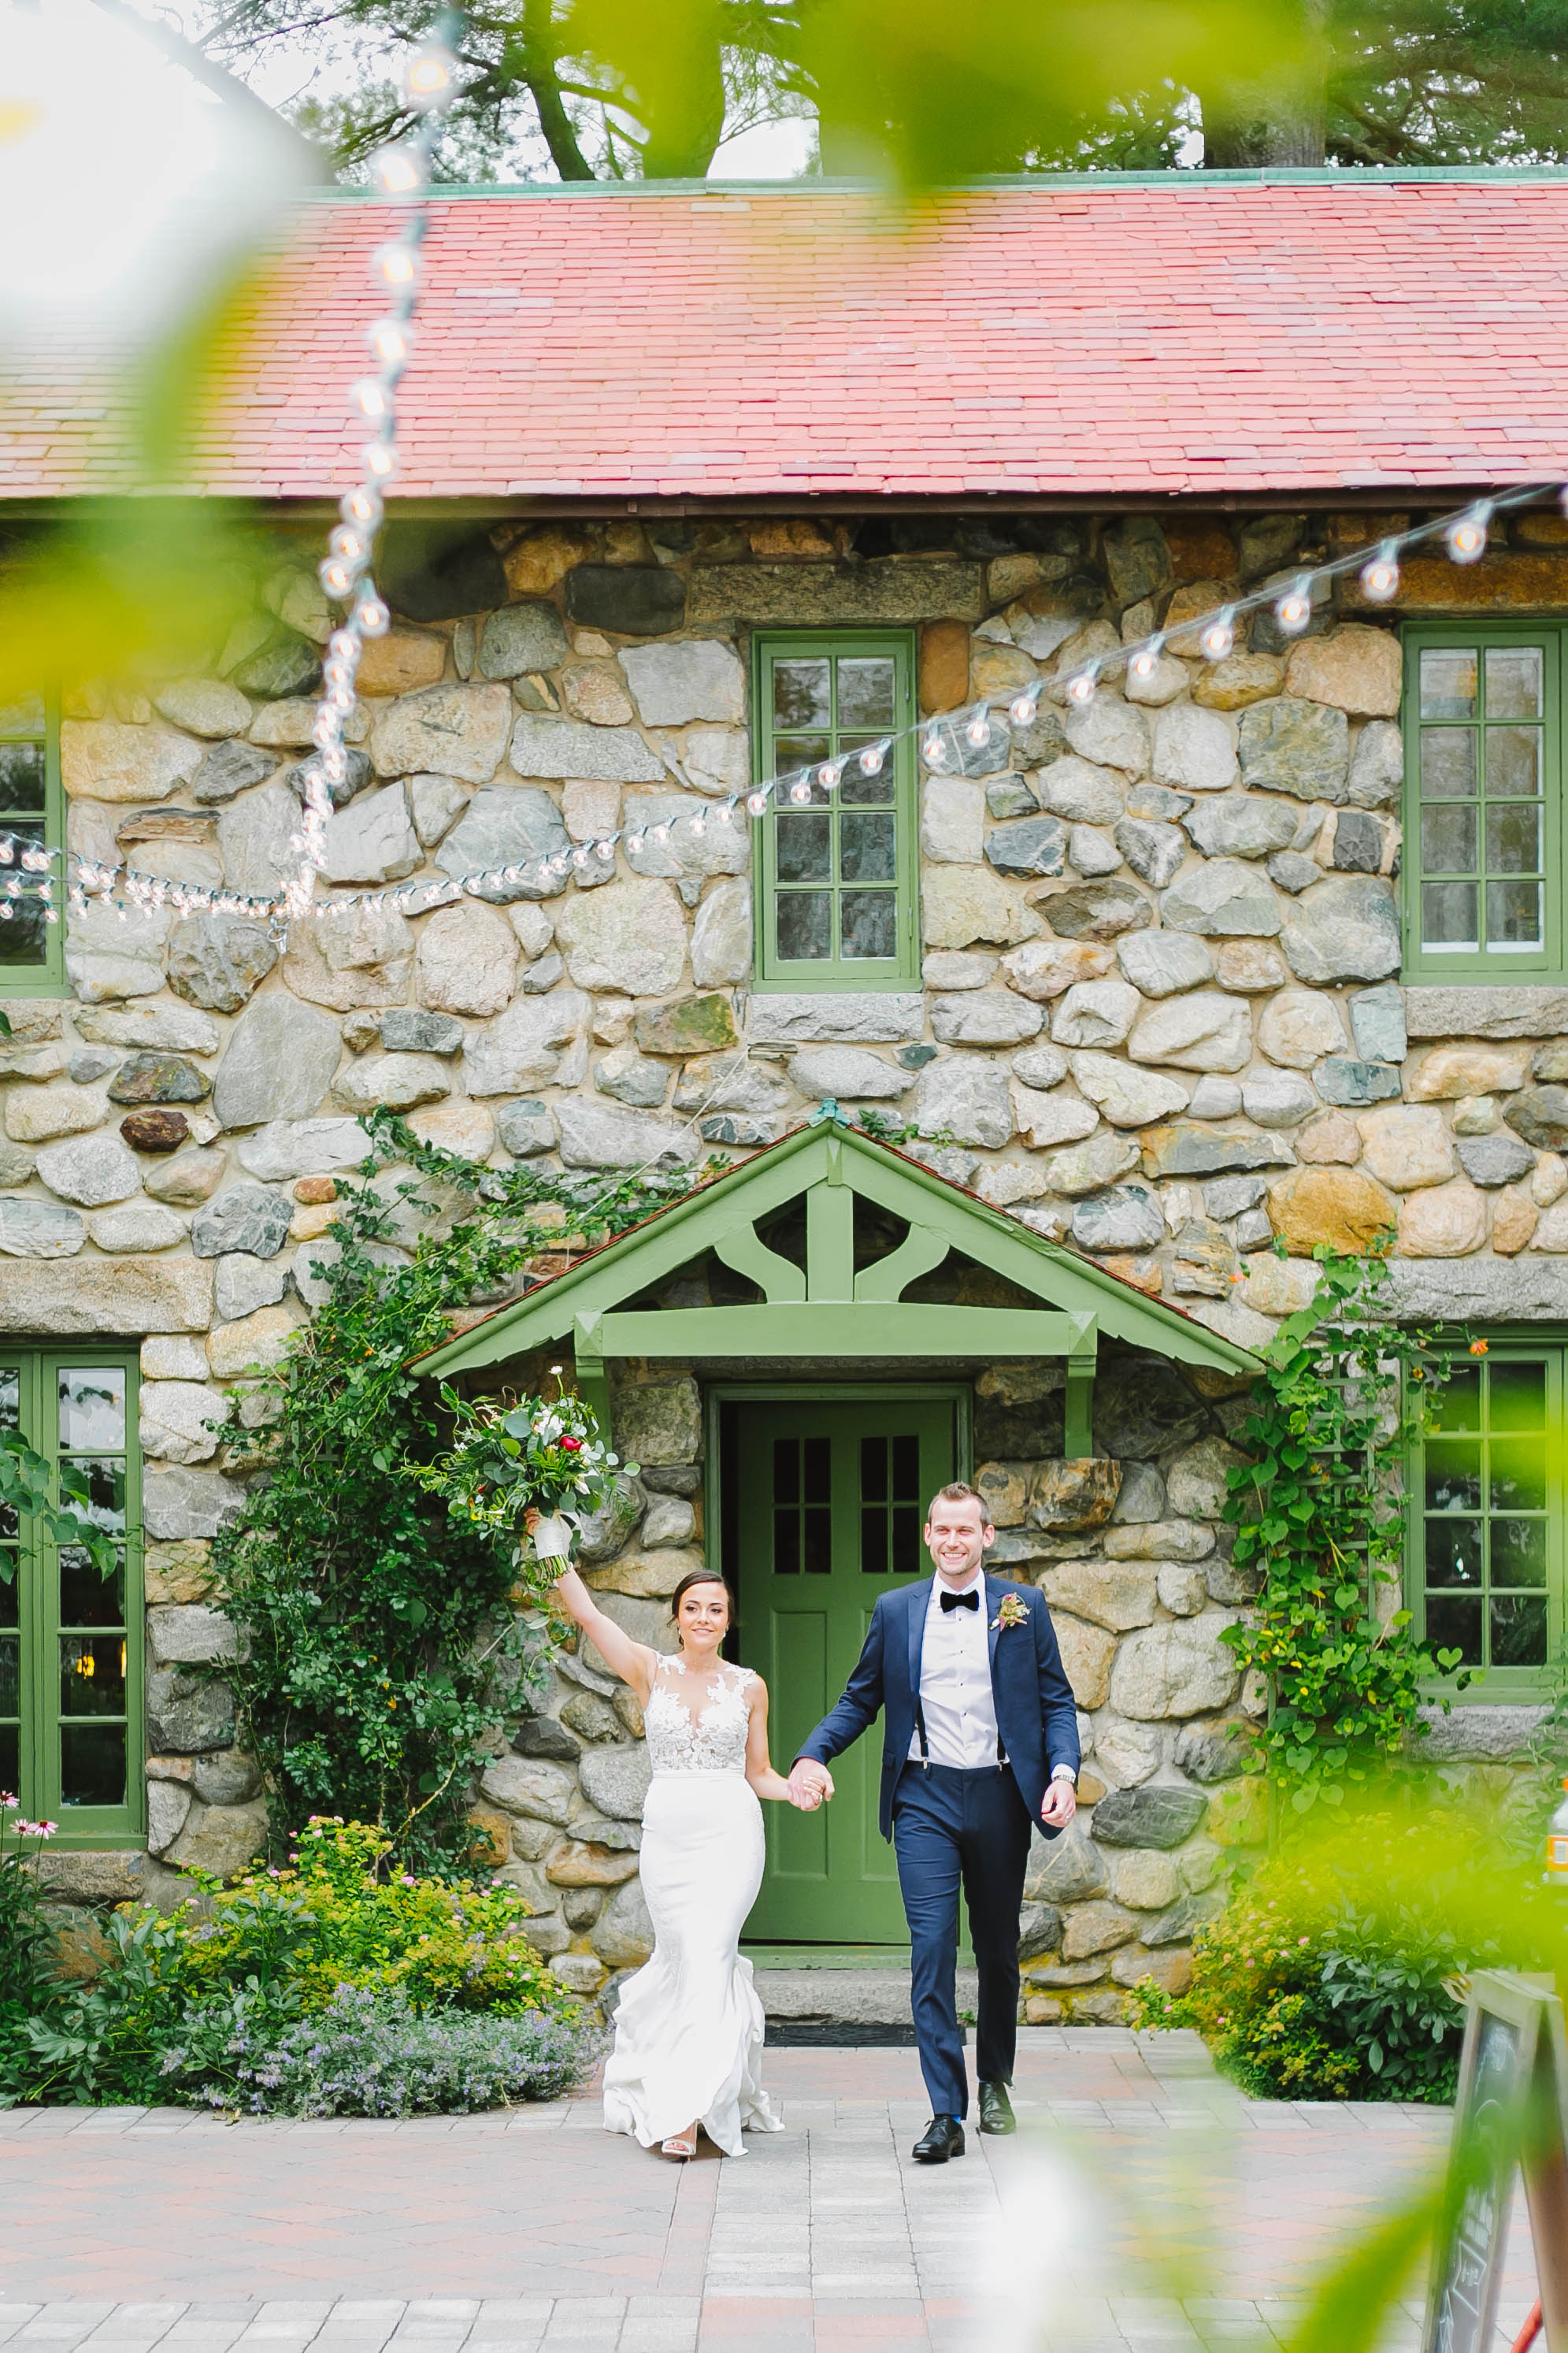 Willowdale Estate Wedding Boston Topsfield MA Italian Garden mansion house wedding - Emily Tebbetts photography-5.jpg